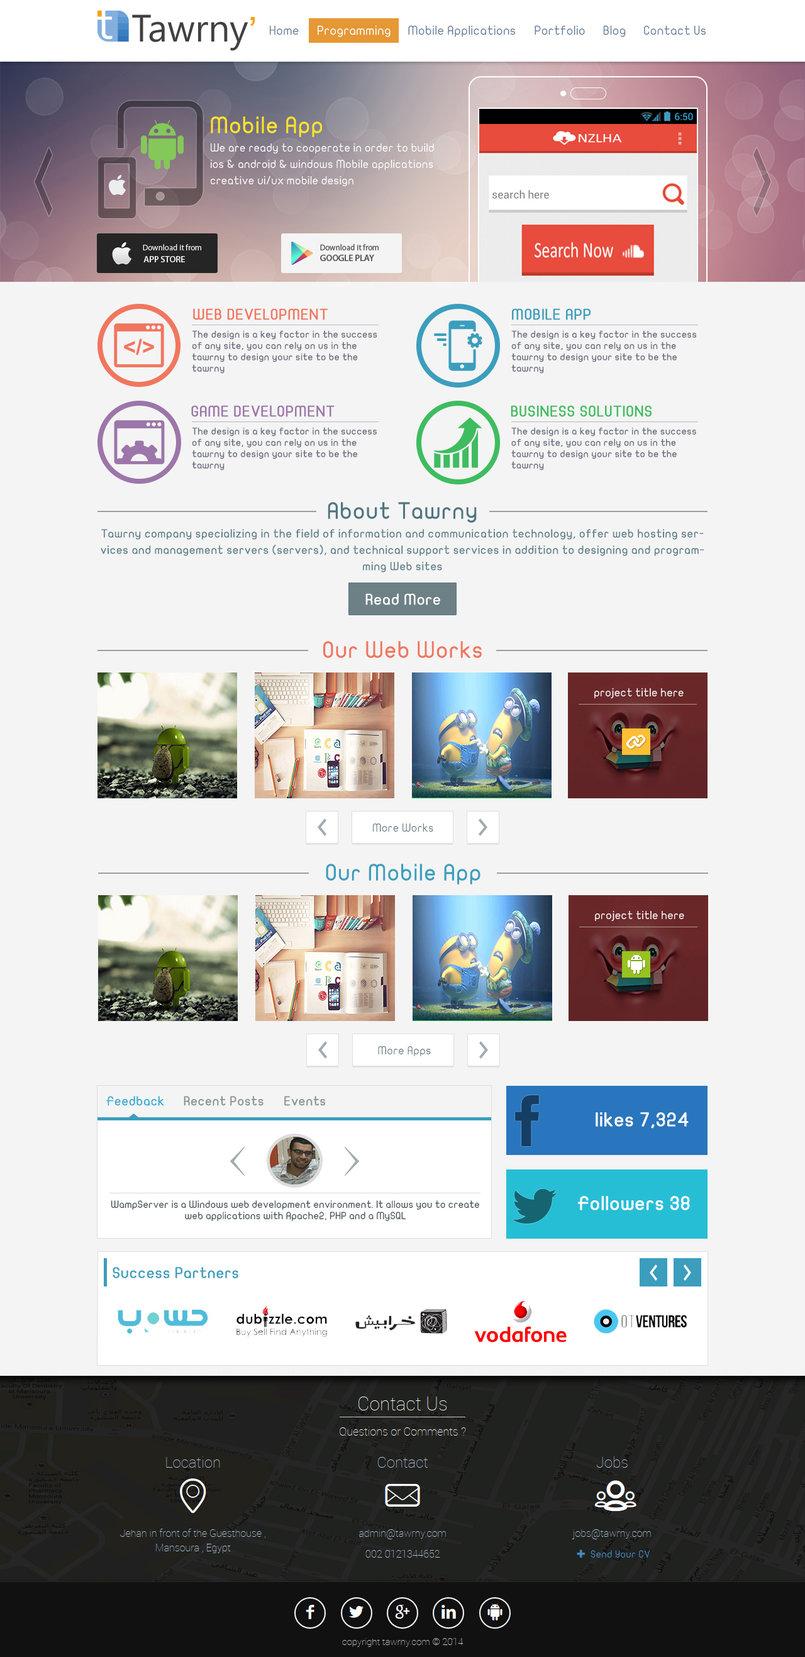 Tawrny v3.0 template design